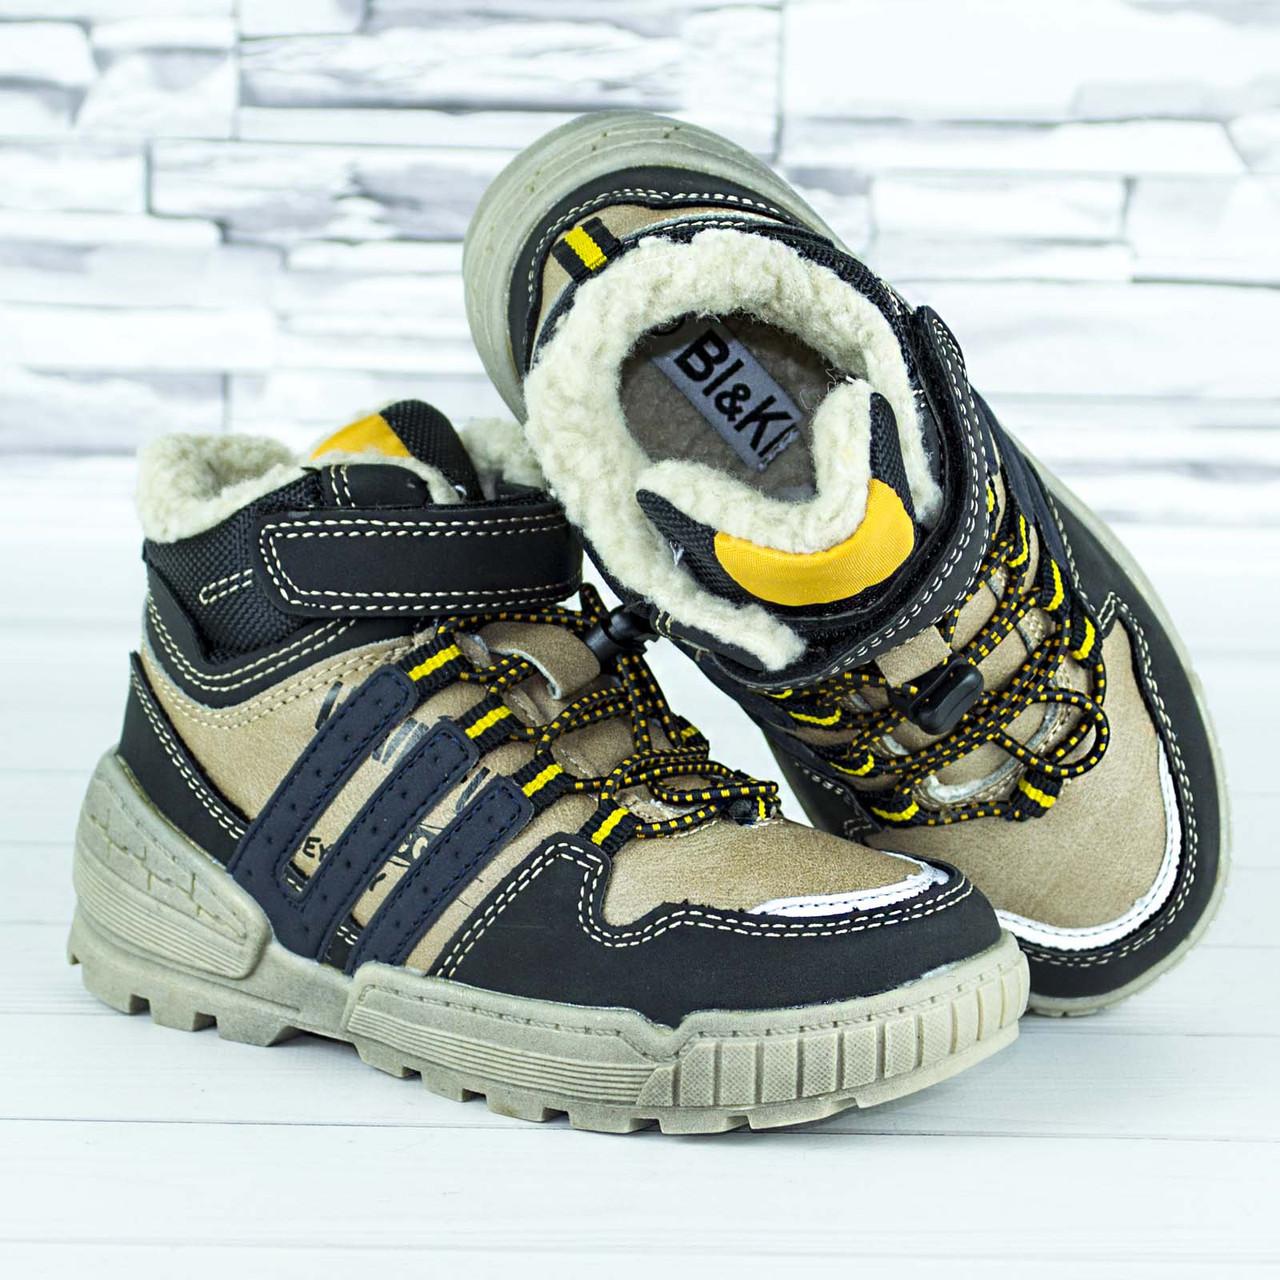 Ботинки для мальчика зимние на плотном утеплителе Bi&Ki b-481